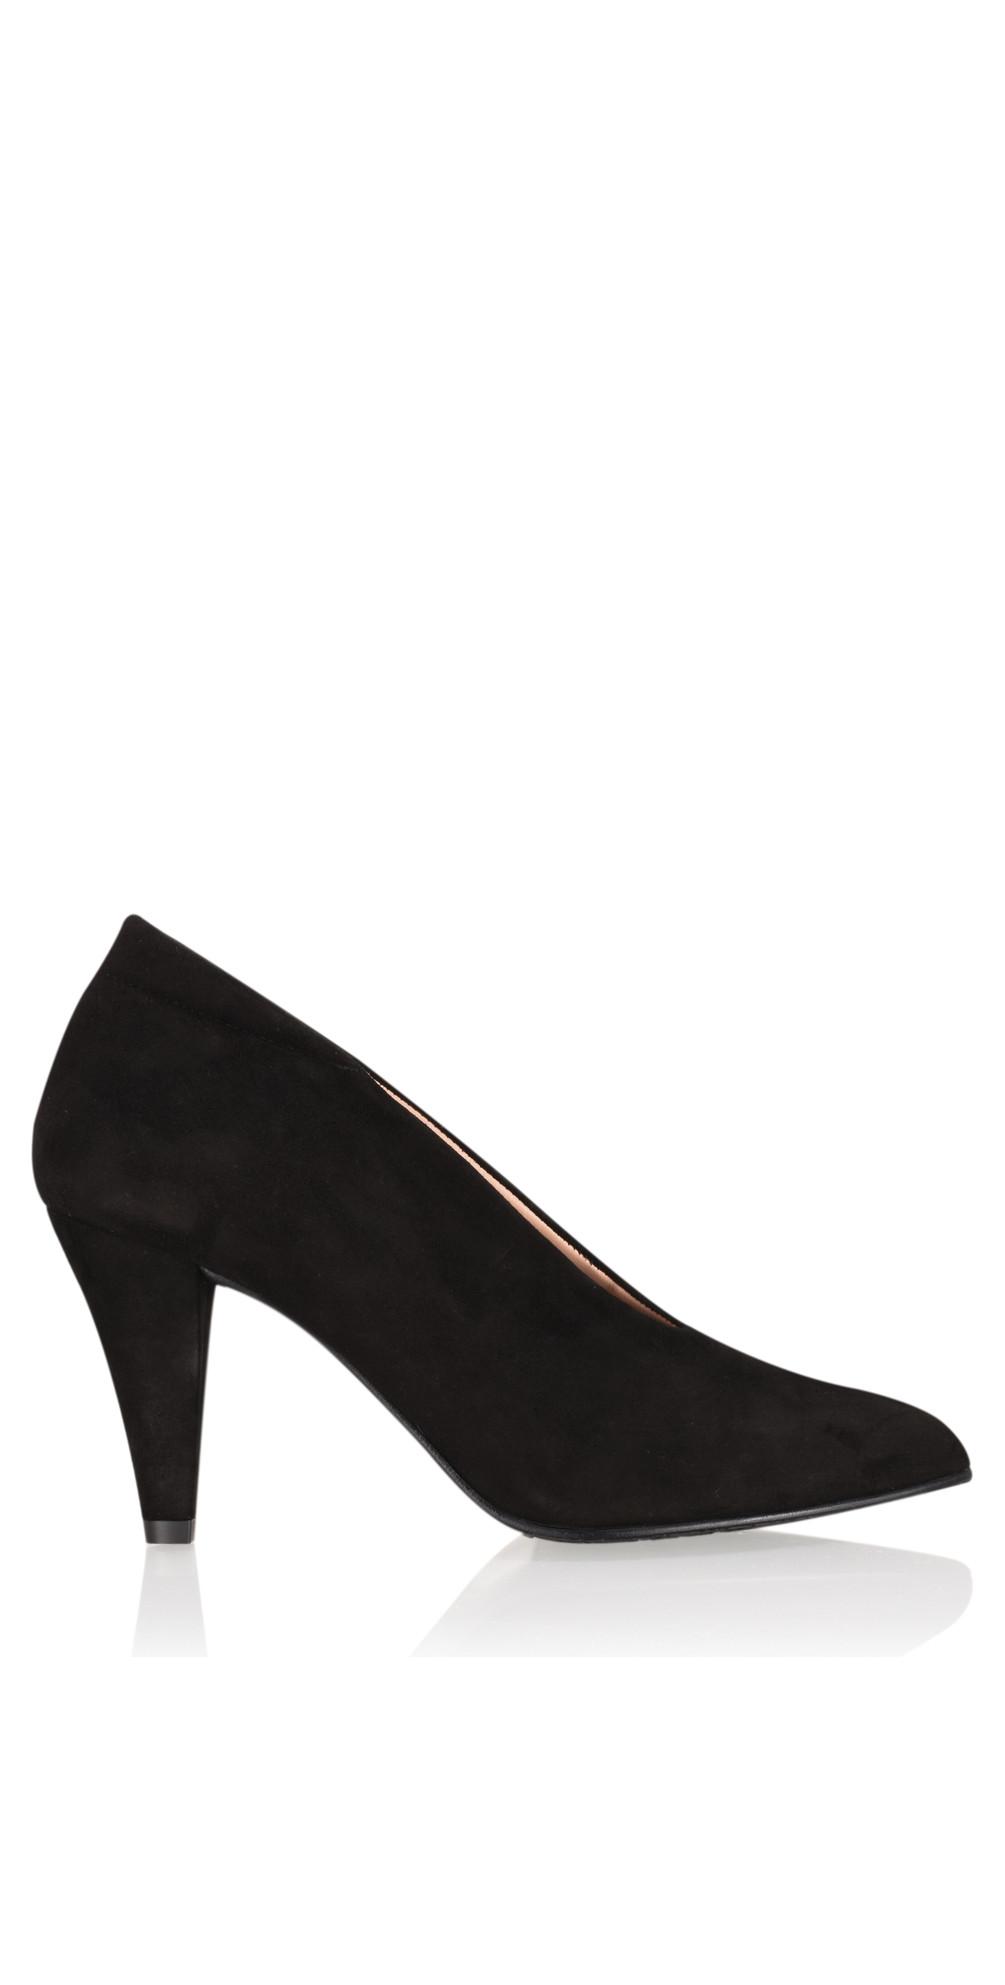 Samantha Court Shoe main image